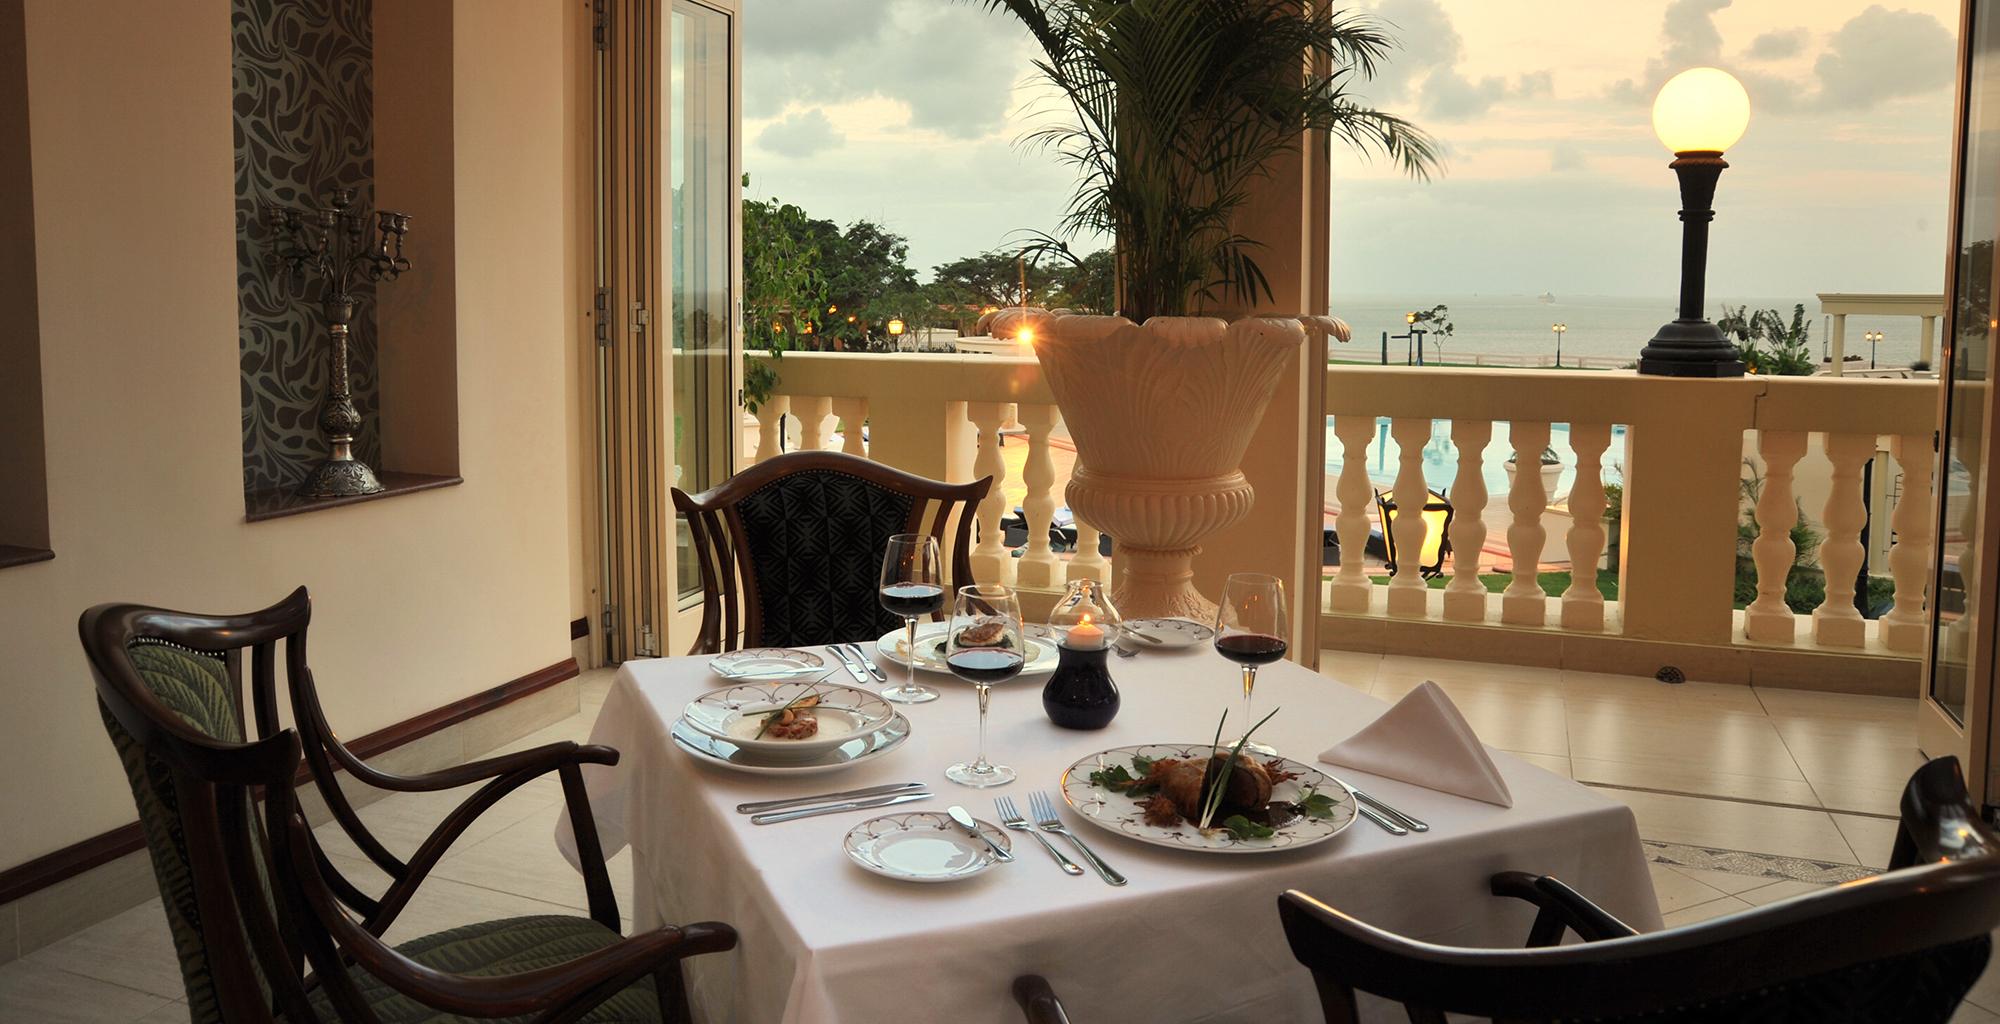 Mozambique-Maputo-Inhambane-Polona-Serena-Hotel-Dining